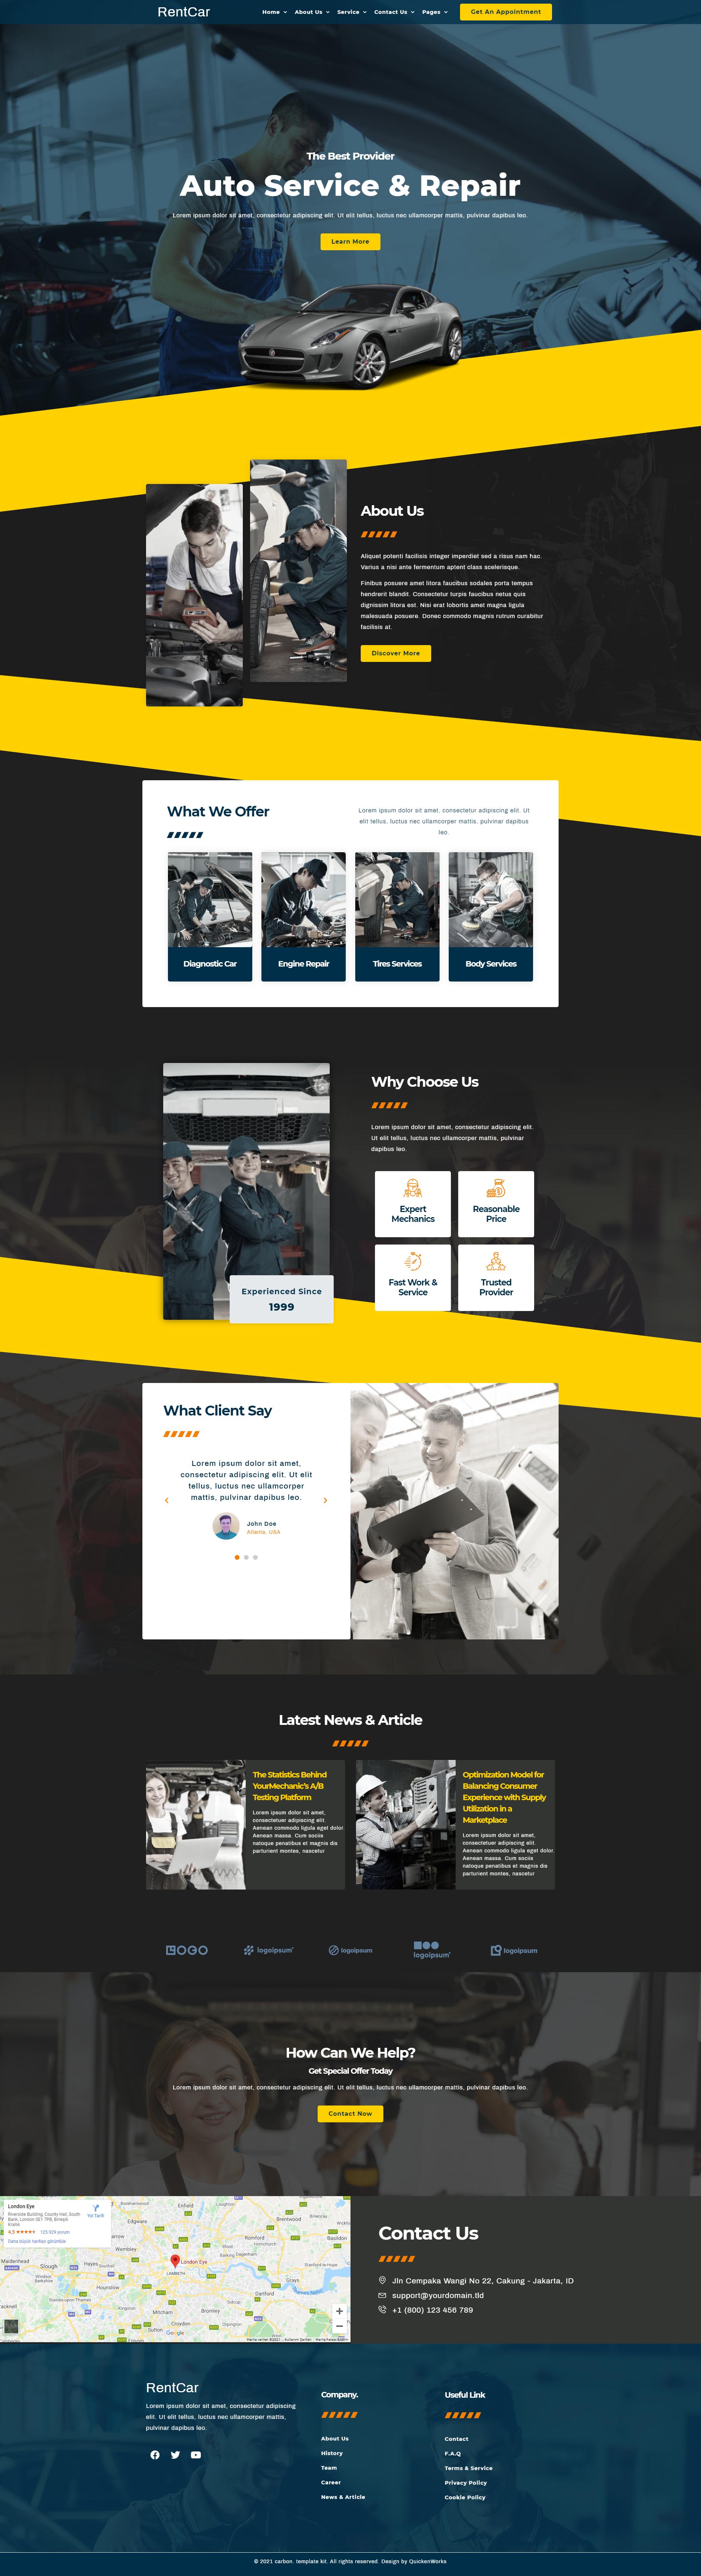 screencapture-brosurku-online-kits-carbon-template-kit-homepage-2021-03-10-12-32-30